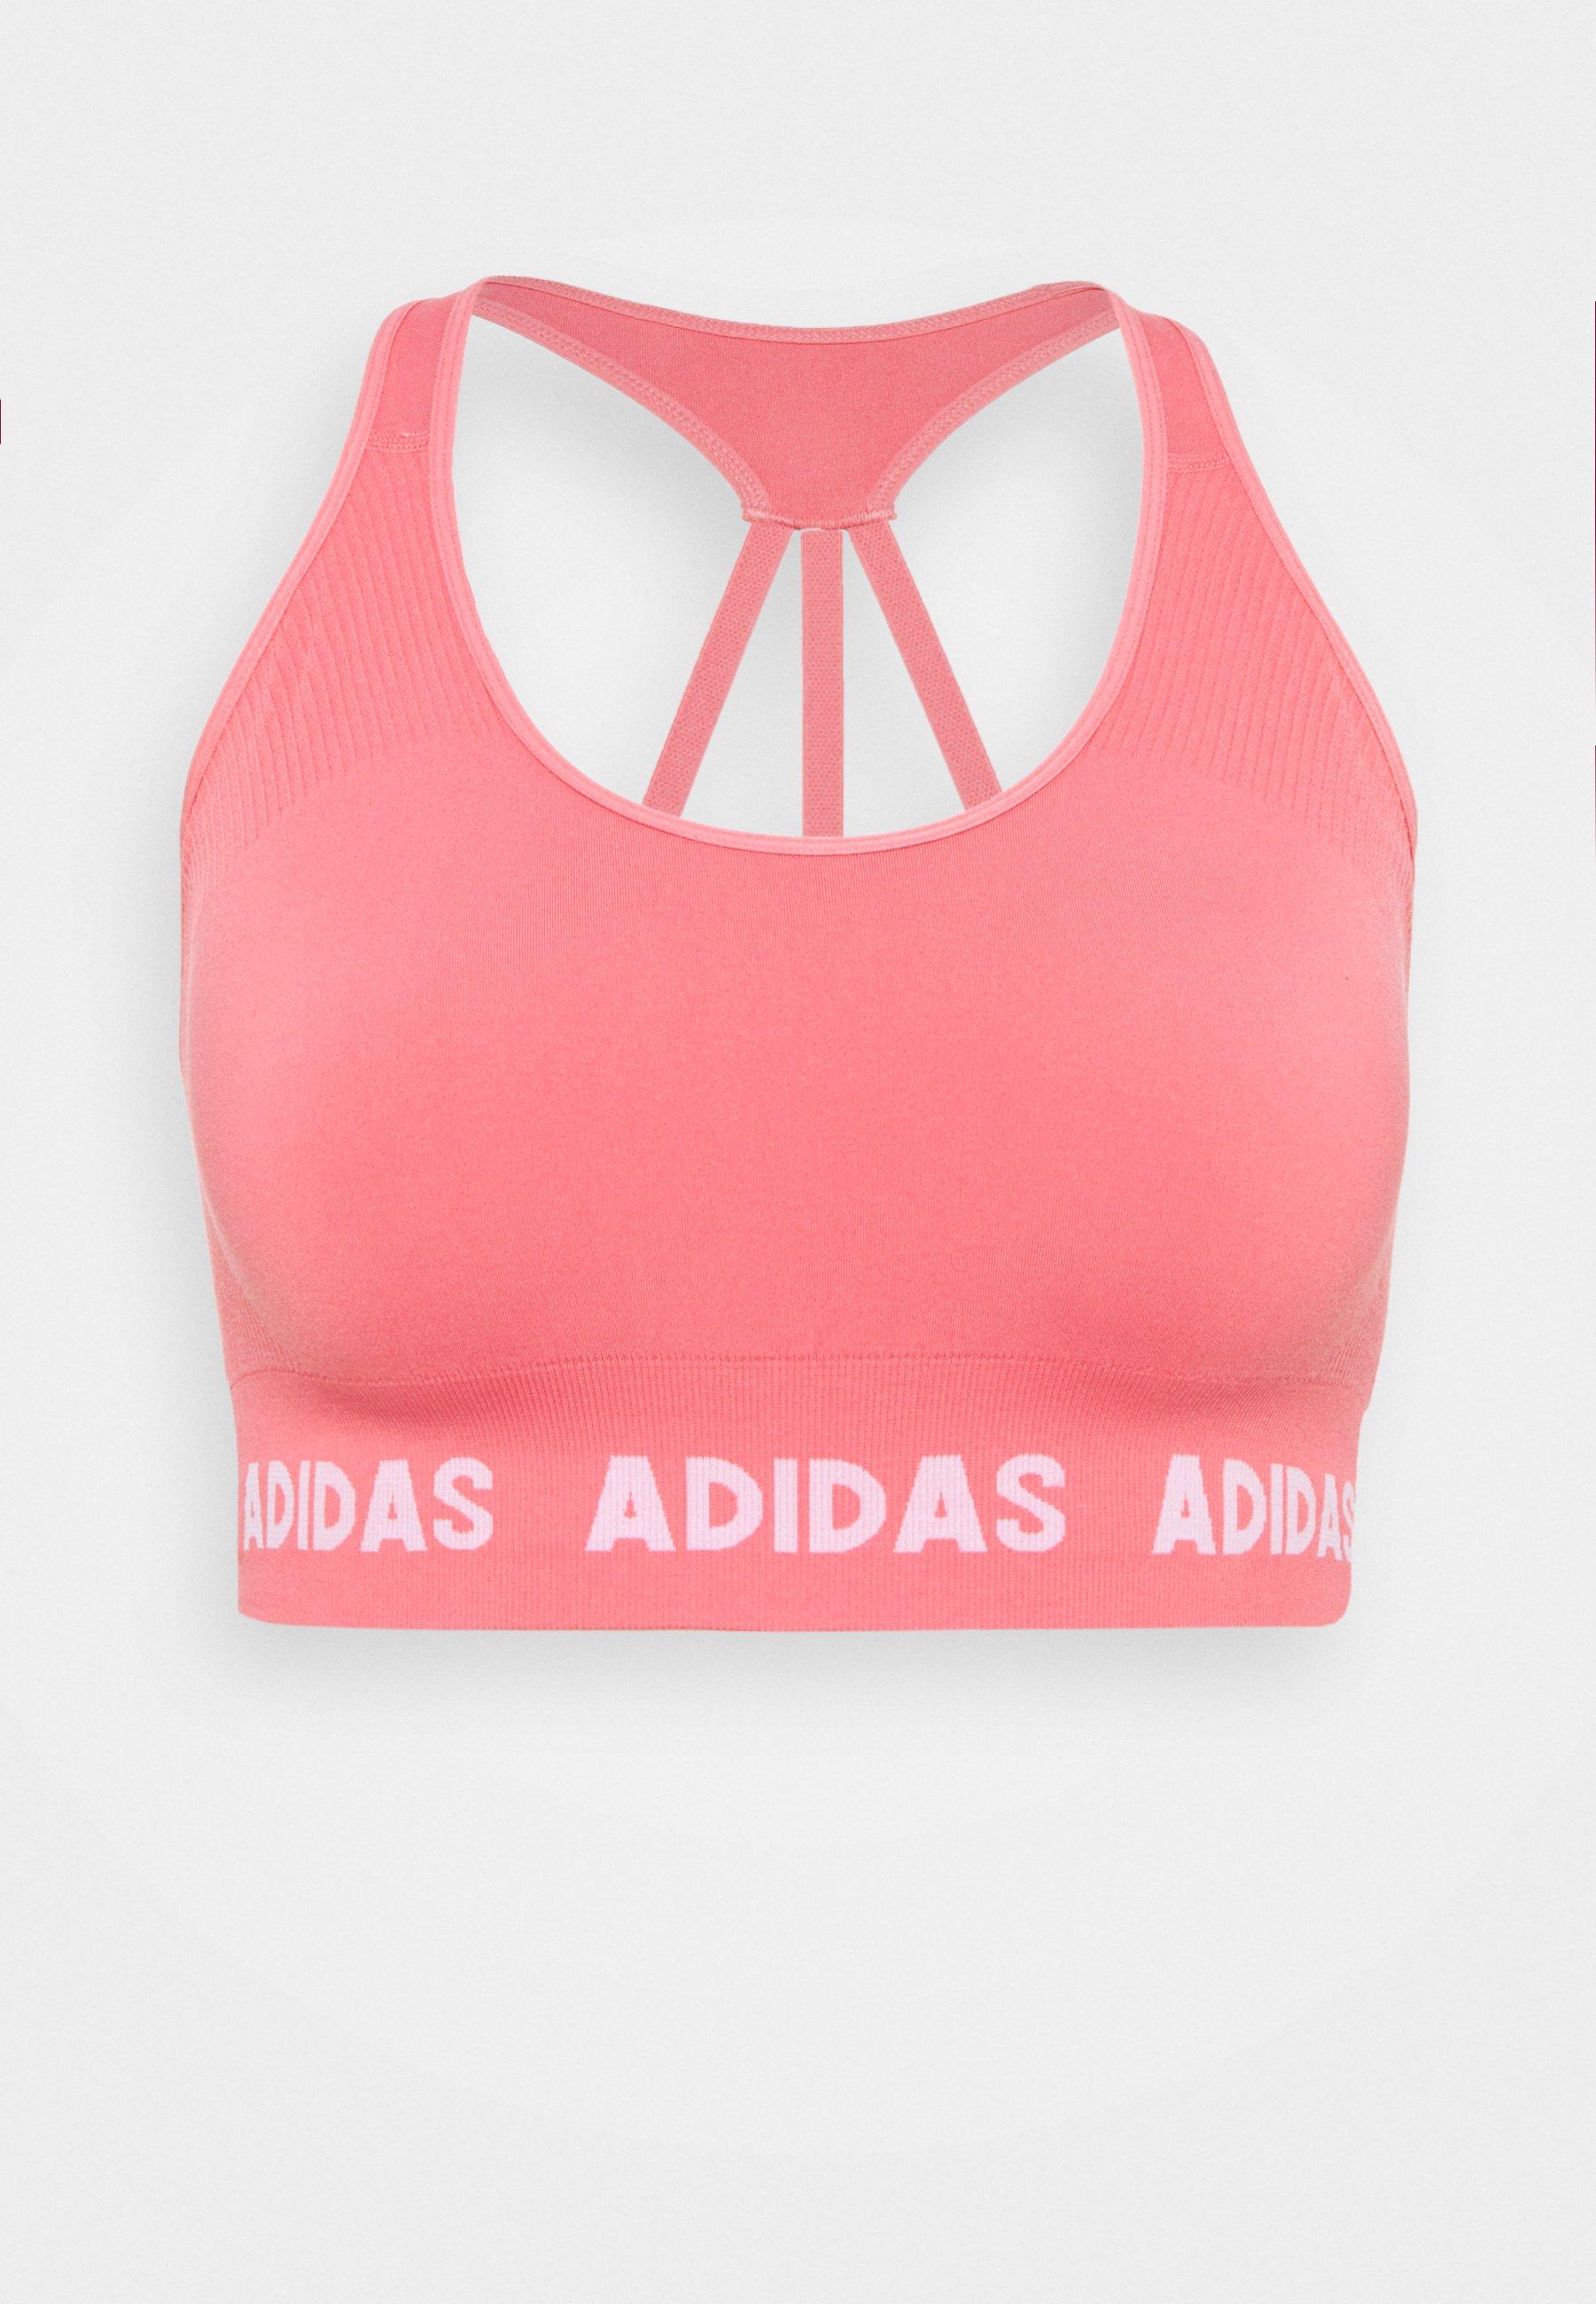 Women AEROKNIT PS TRAINING WORKOUT DESIGNED4TRAINING PRIMEGREEN SPORTS BRA LIGHT SUPPORT FITTED - Light support sports bra